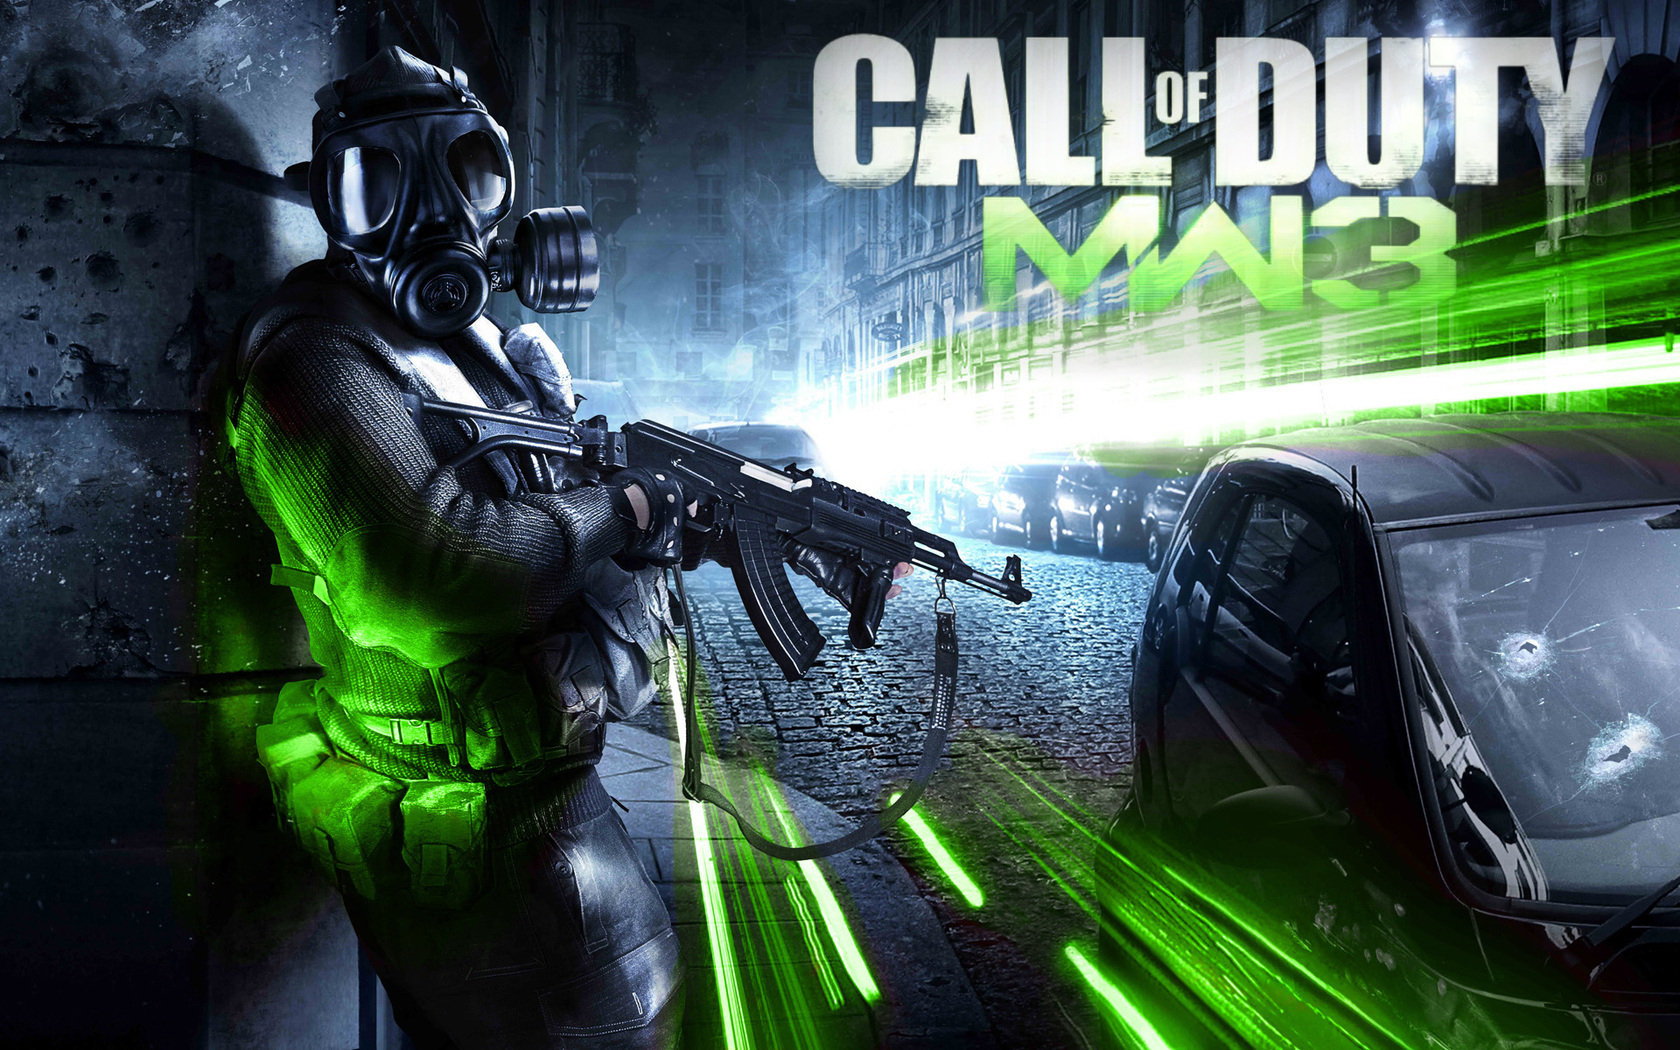 Call Of Duty Modern Warfare 3 Screen   Wallpaper Pin it 1680x1050